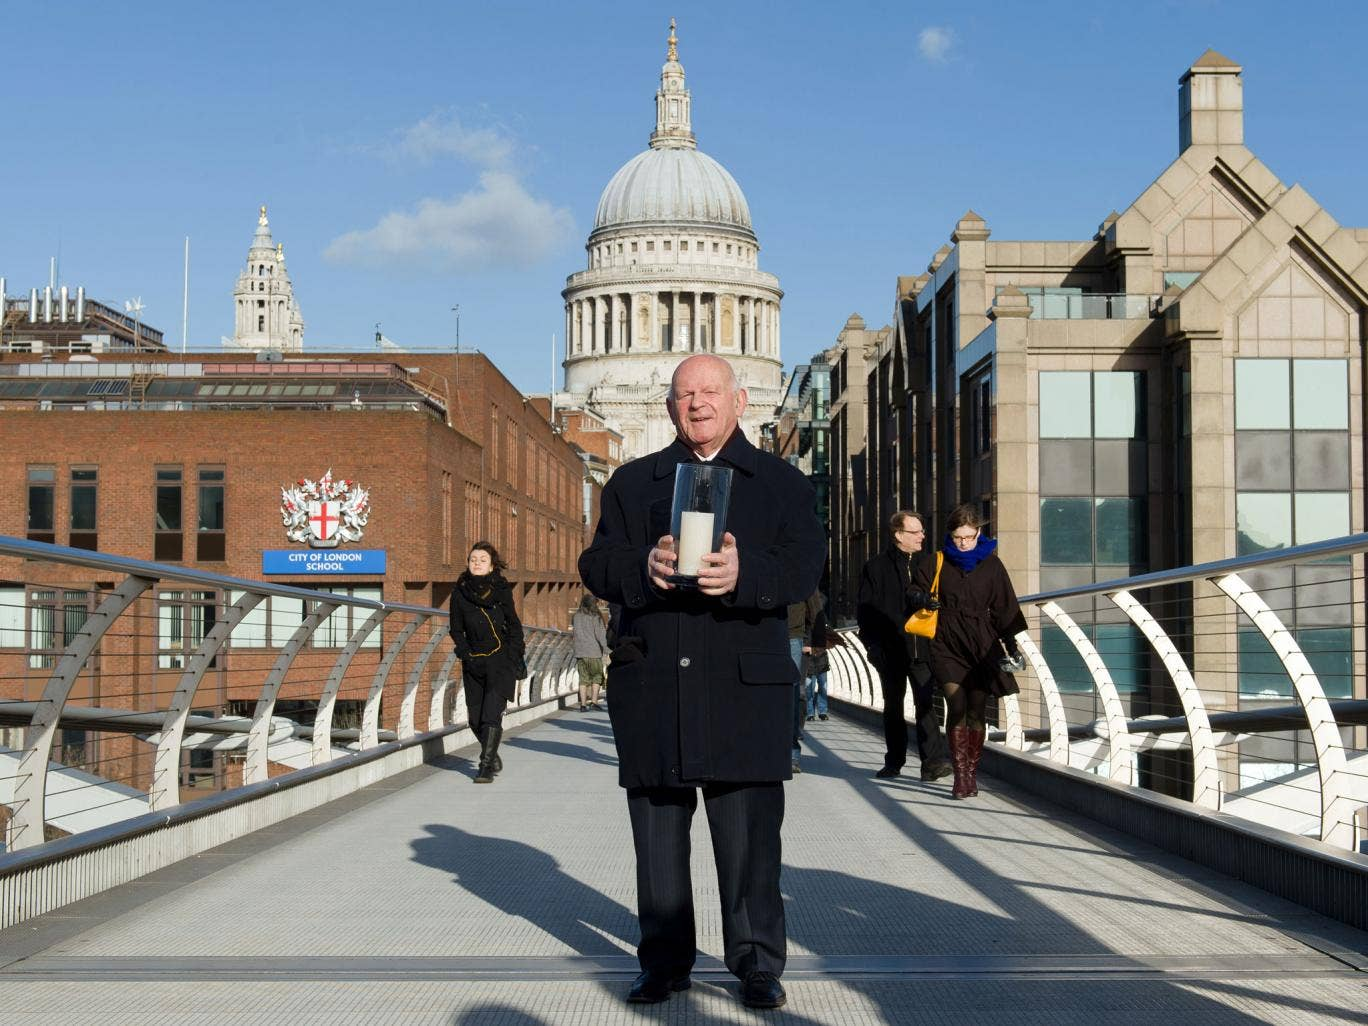 Holocaust survivor Ben Helfgott holds a memorial candle on the Millennium Bridge in London on Holocaust Memorial Day